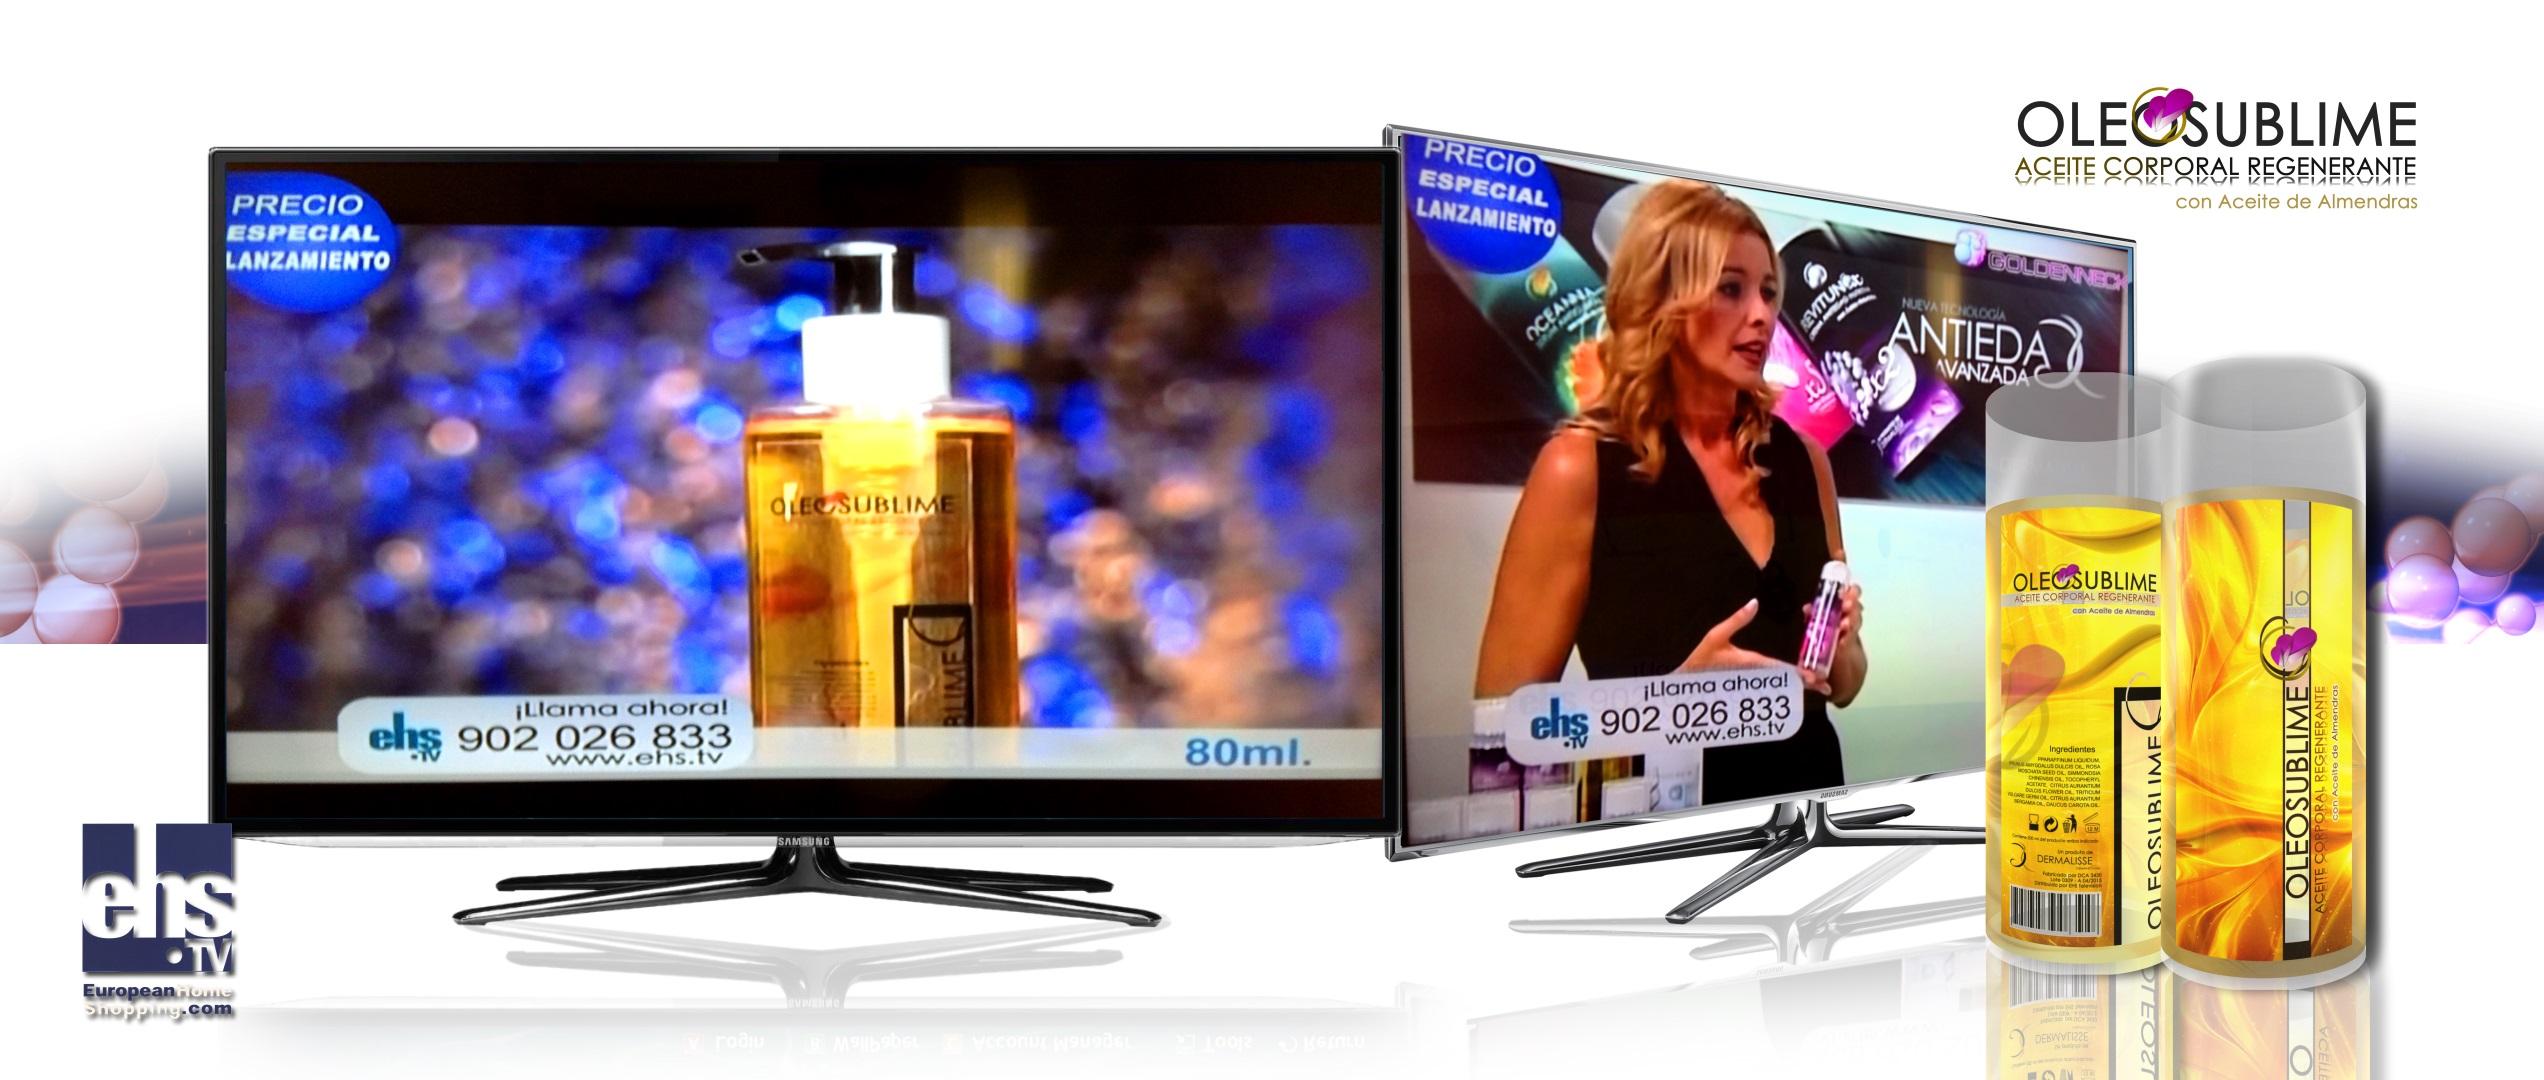 https://www.perfectpixel.es/wp-content/uploads/2014/07/Dermalisse-Cosmetics-Oleo-Sublime-Screenshots-Anuncio-Spot-Publicitario-by-PerfectPixel-Publicidad-v2.jpg